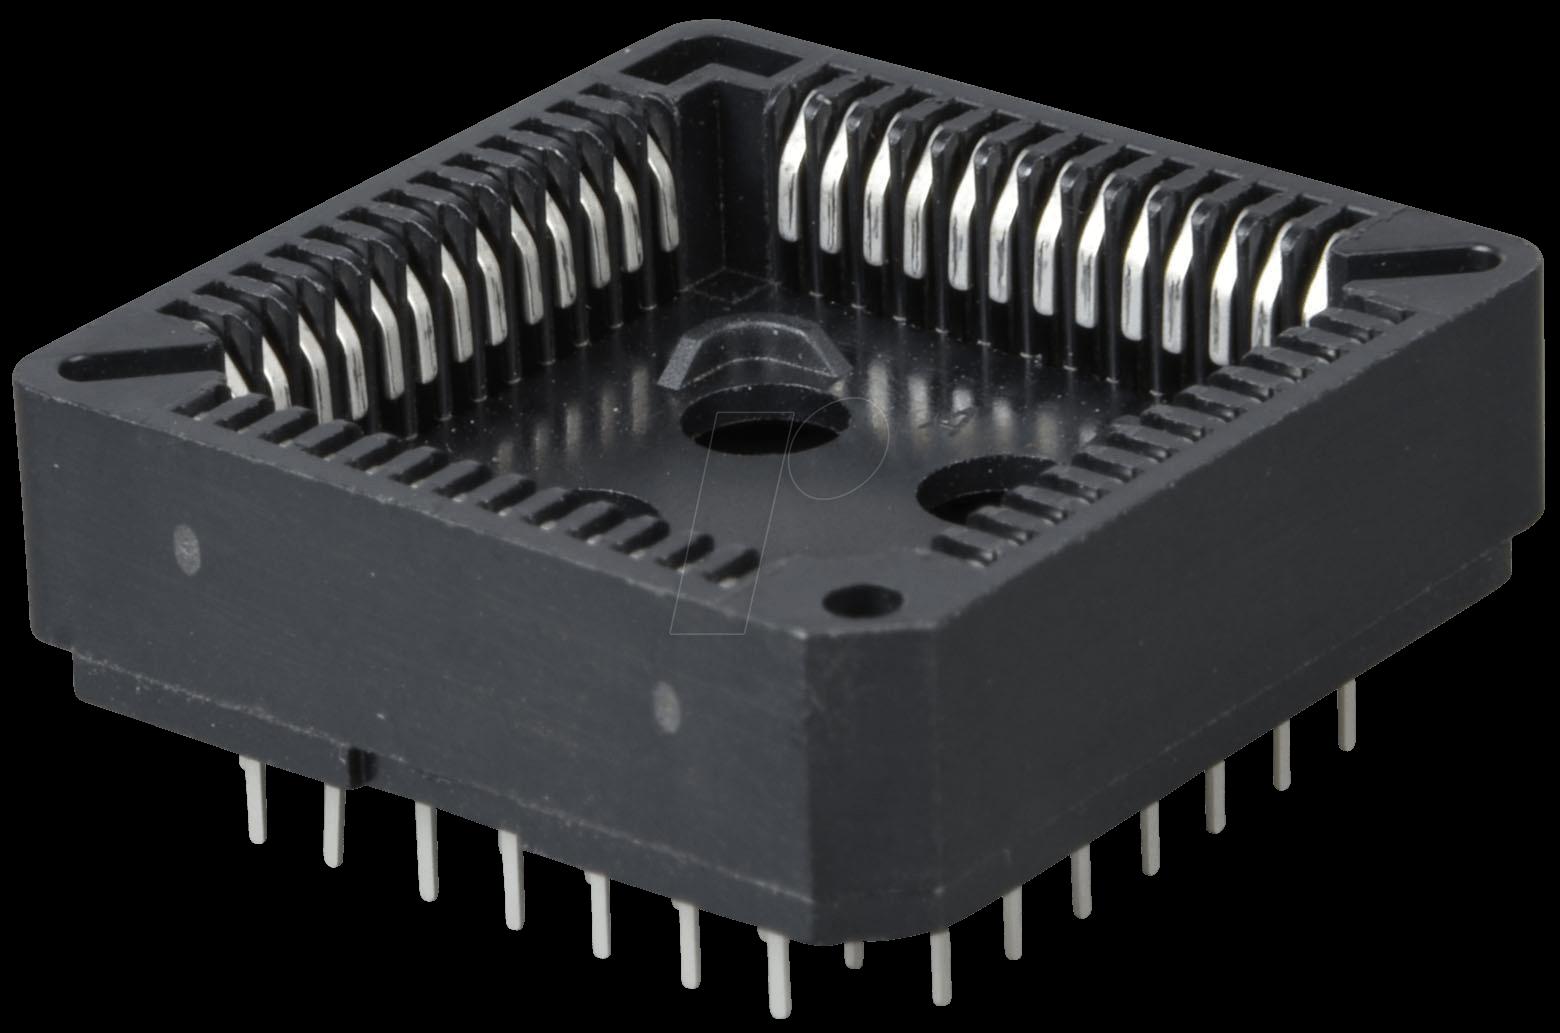 Plcc 52 Ic Socket 52 Pin Plcc At Reichelt Elektronik